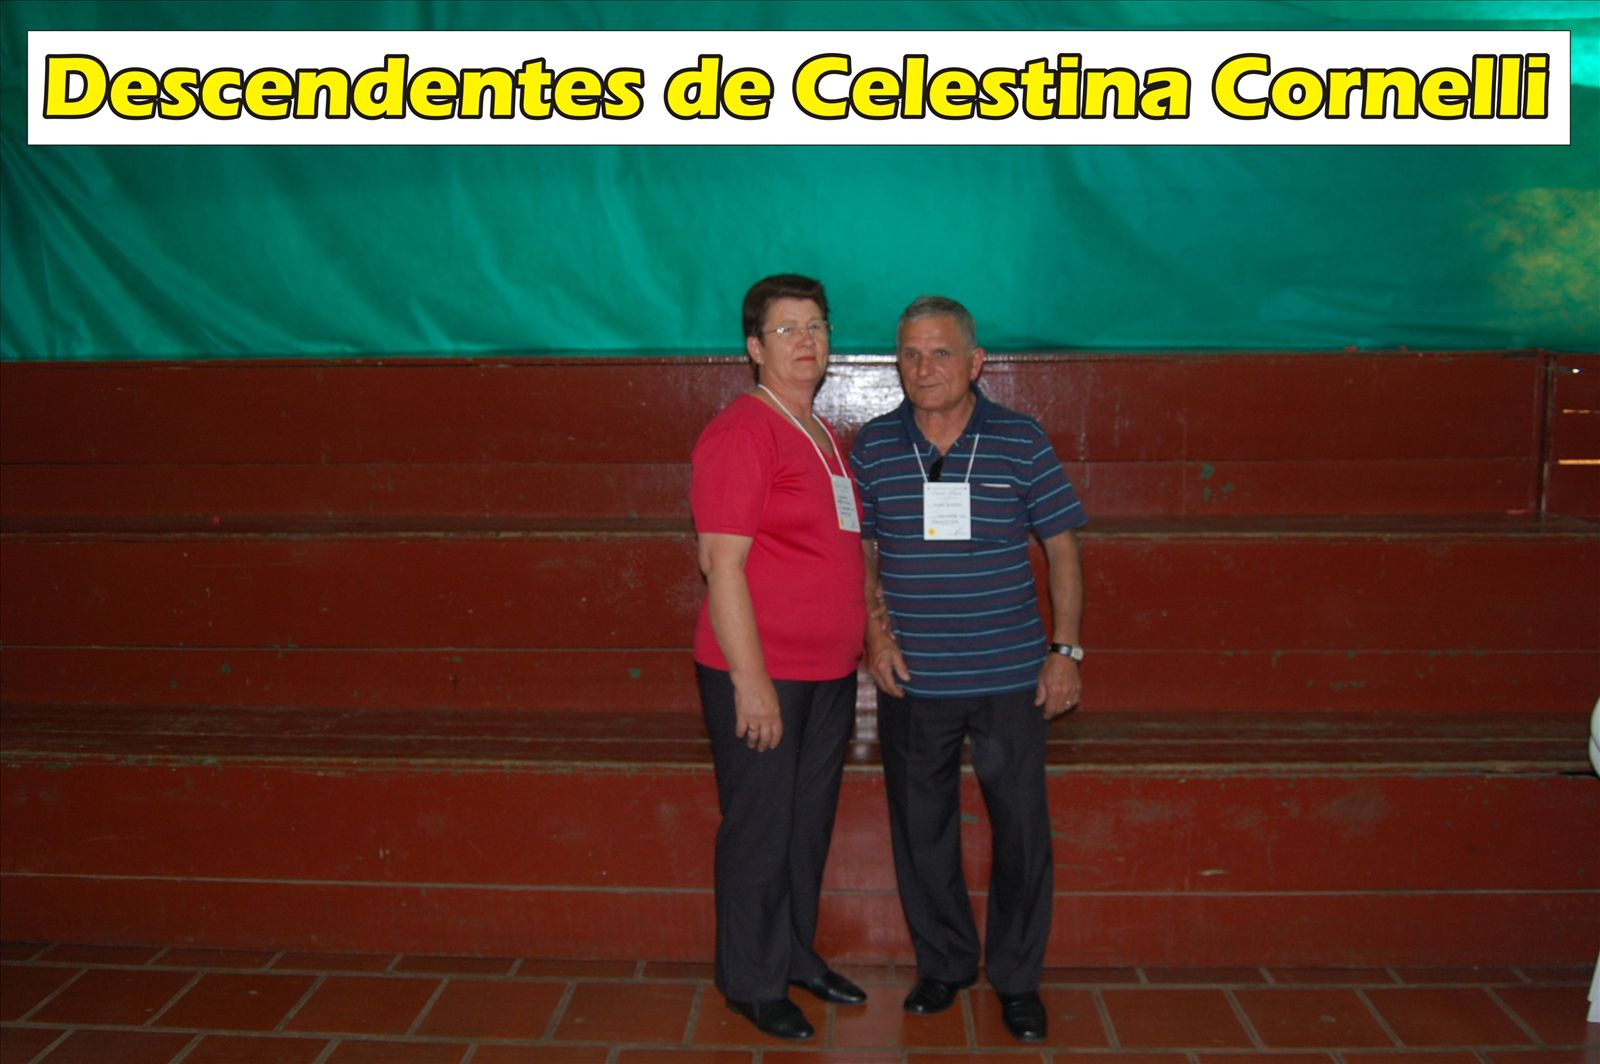 Descendentes de Celestina Cornelli 01_0